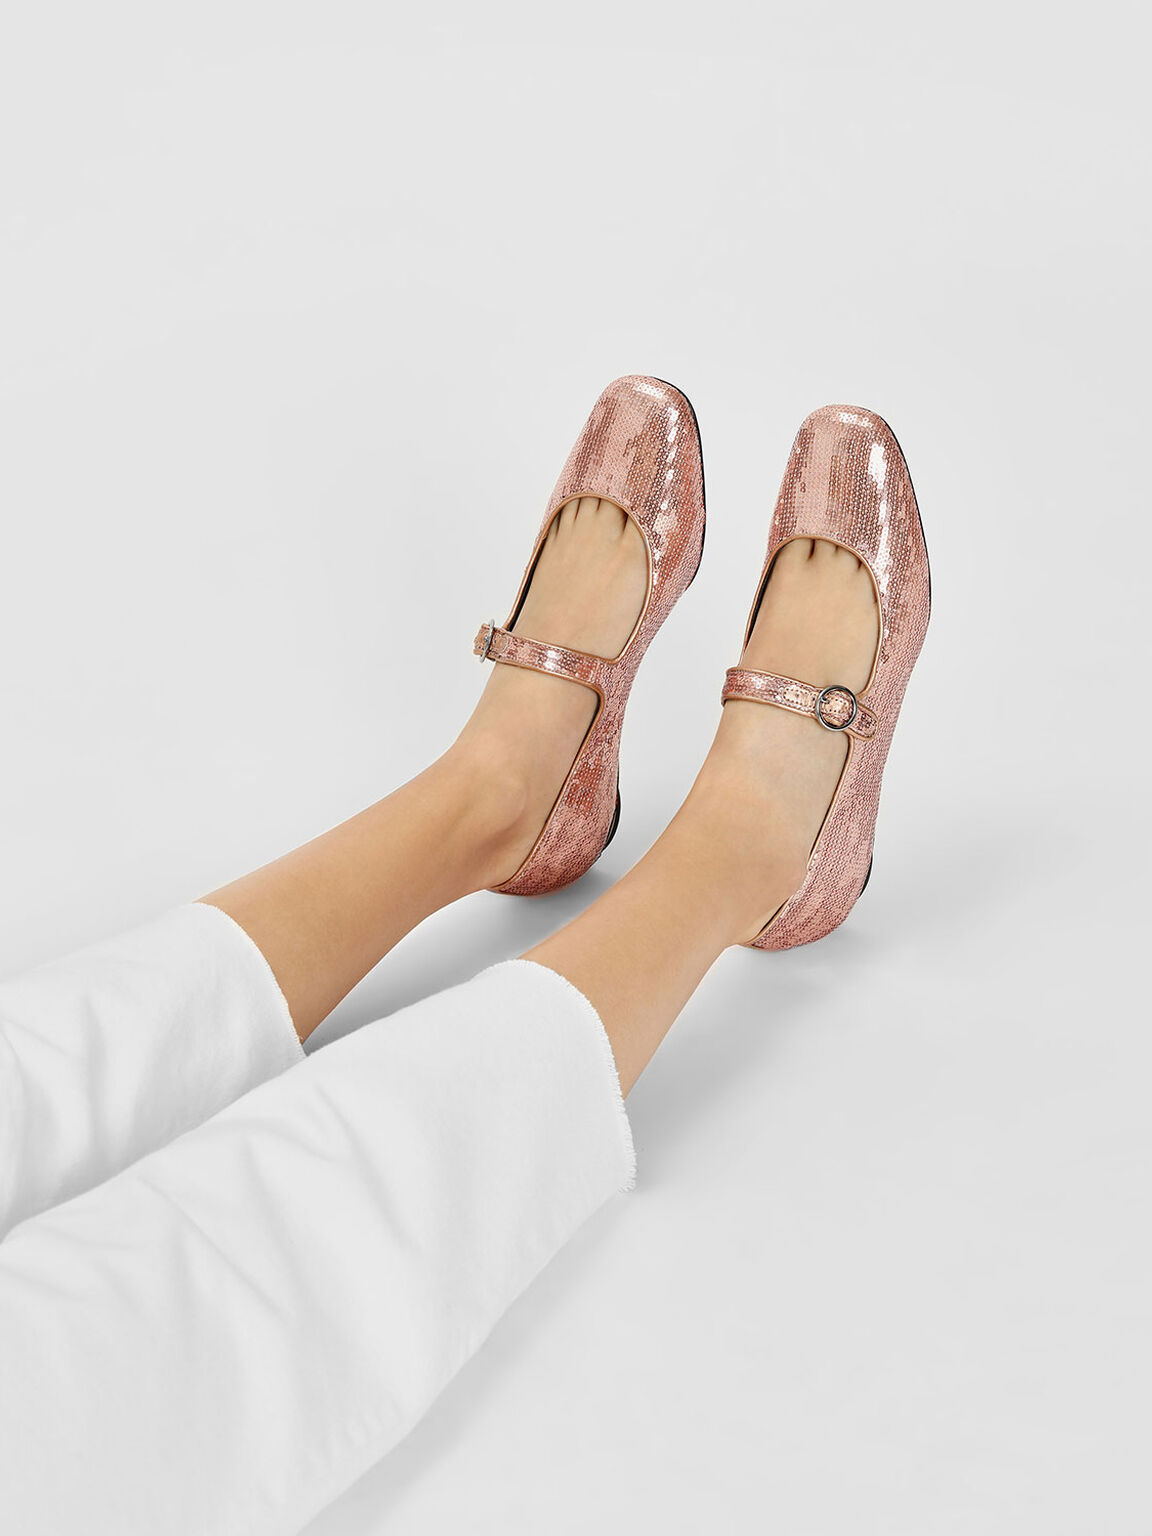 Sequin Mary Jane Flats, Pink, hi-res